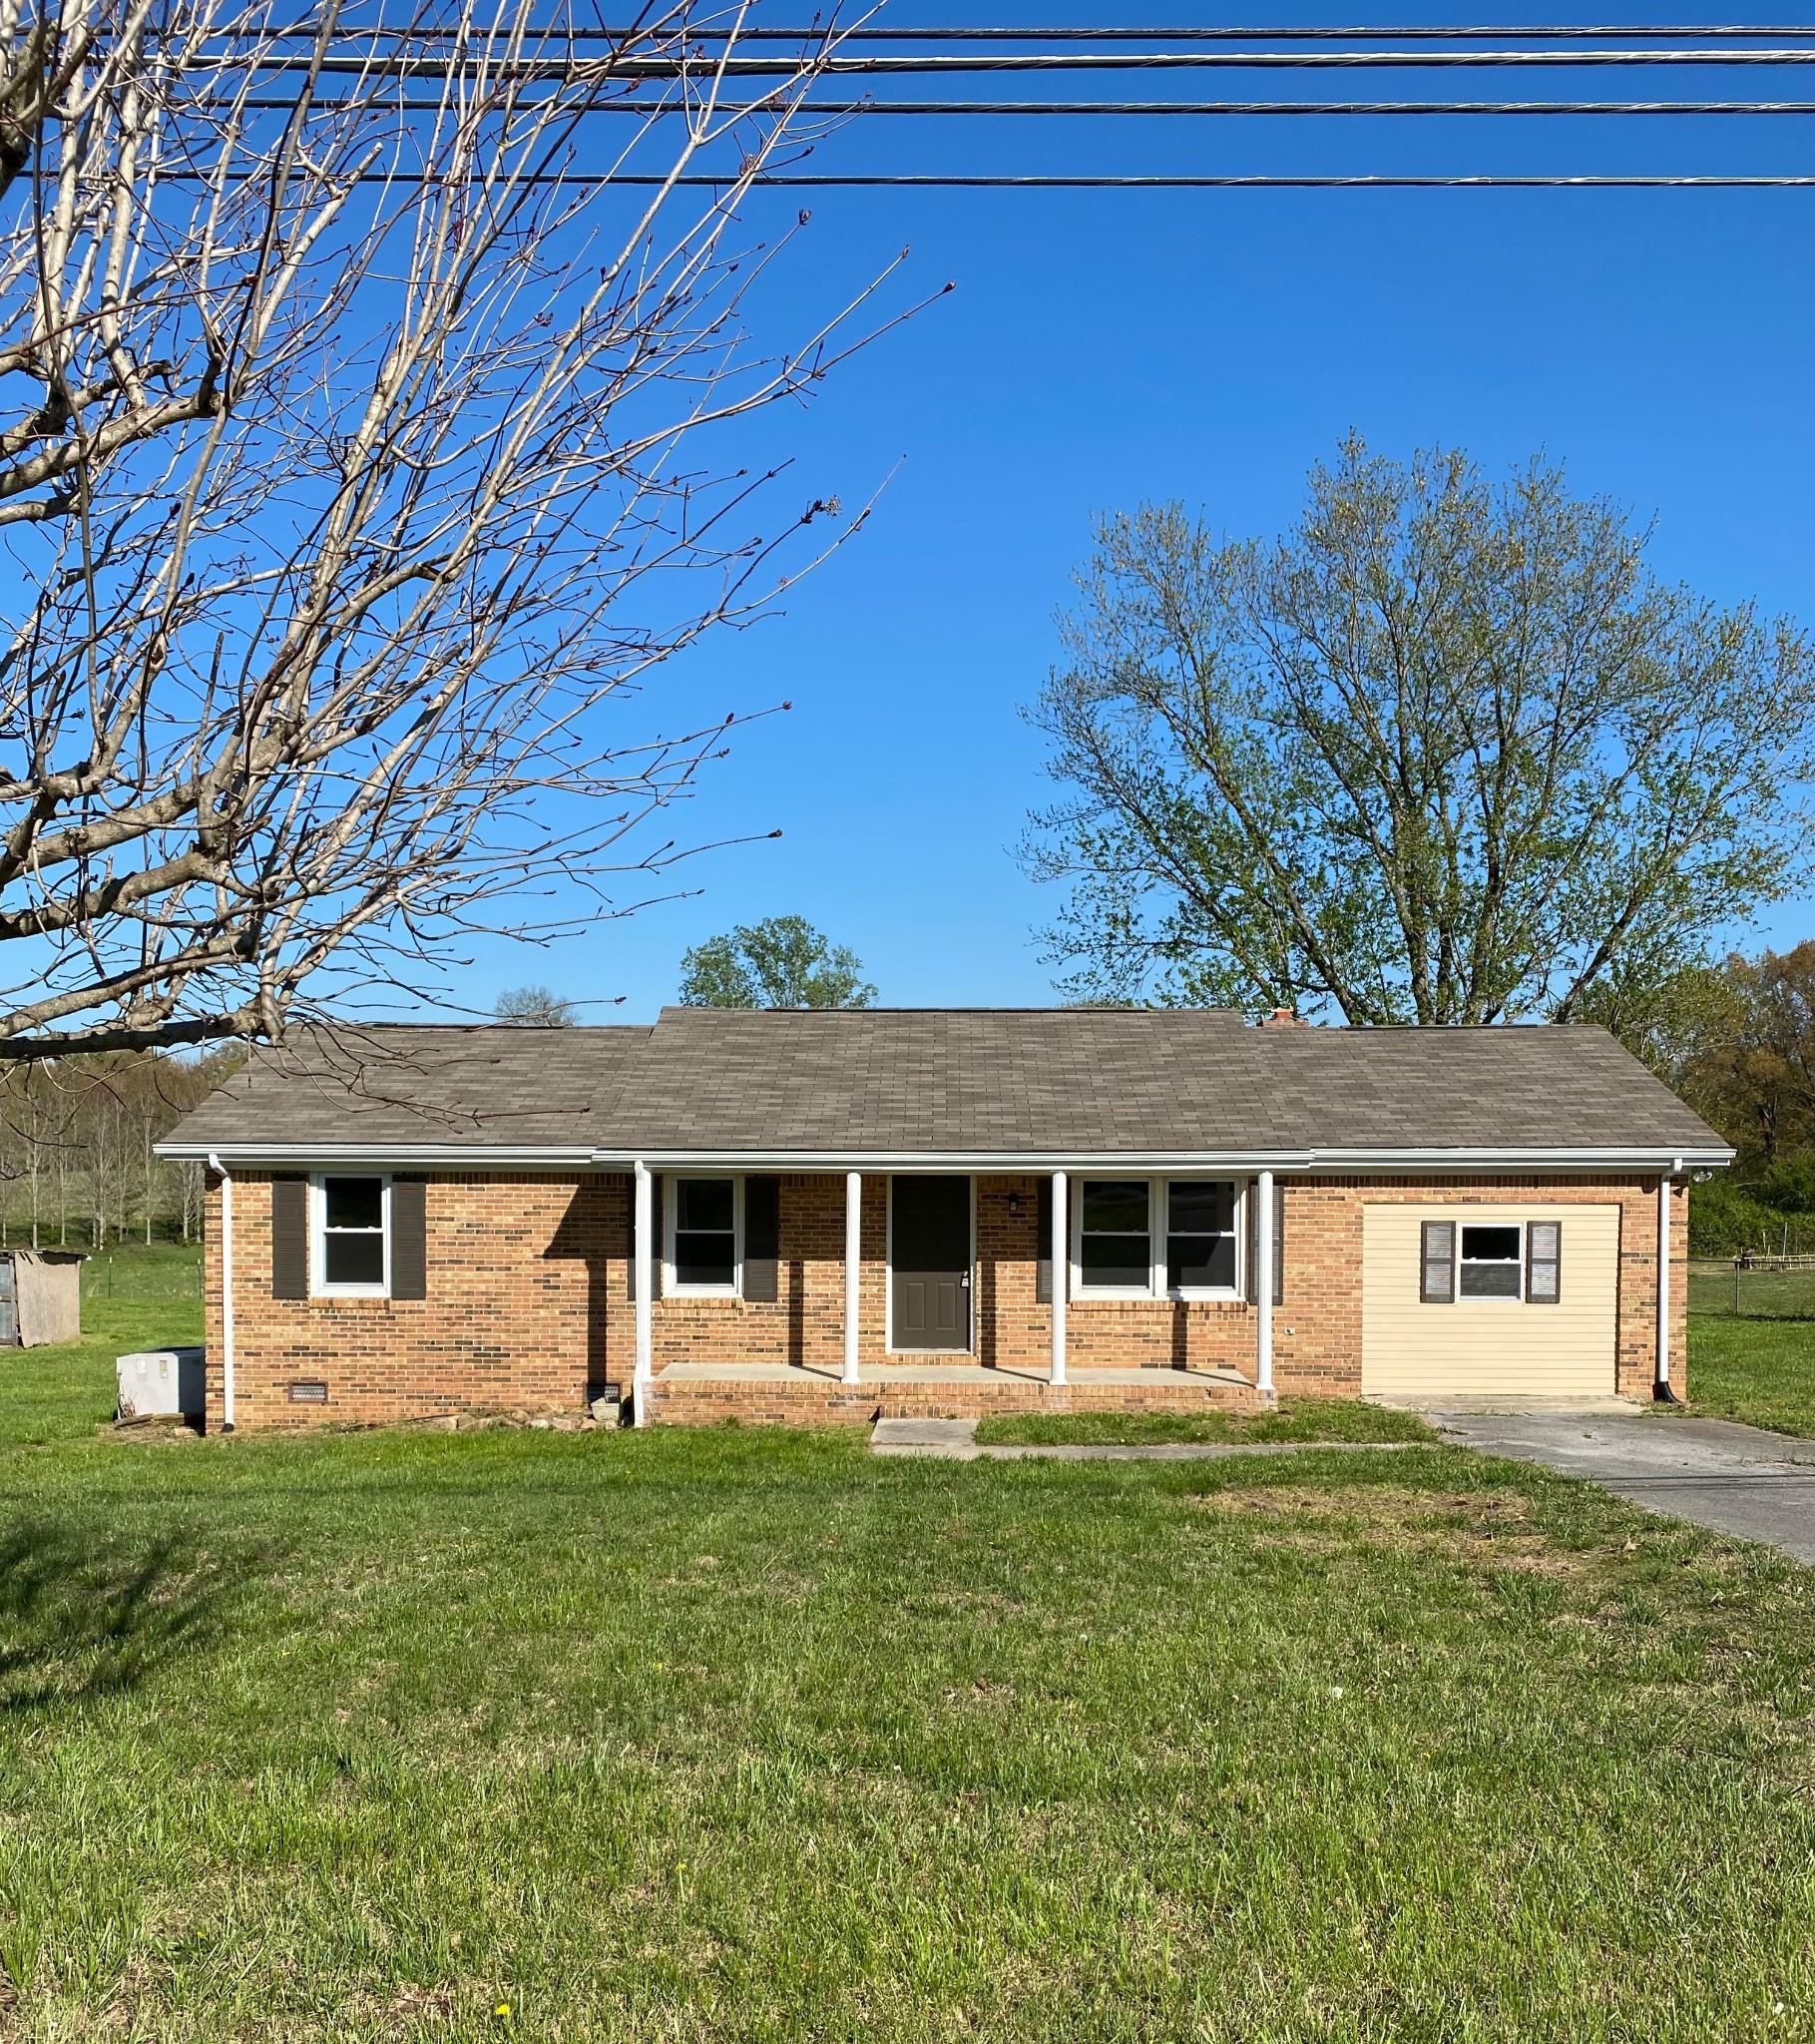 530 John Oliver Rd, Mc Minnville, TN 37110 - Mc Minnville, TN real estate listing